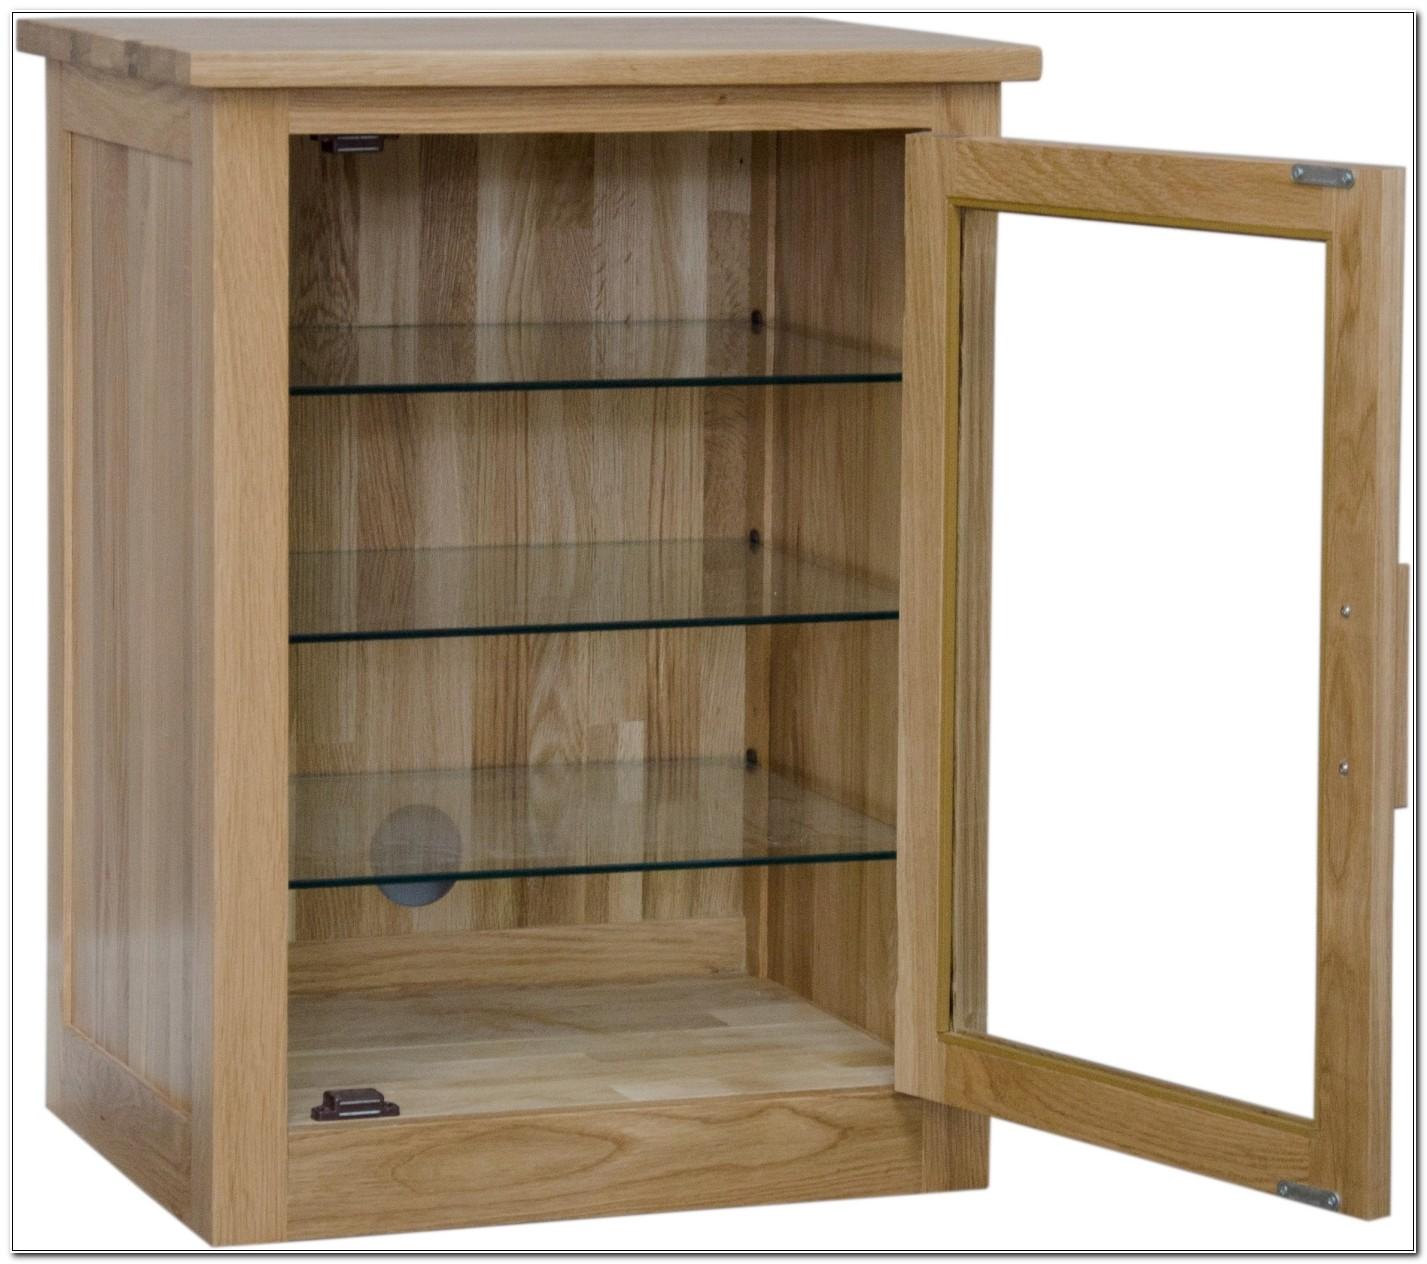 Oak Hifi Cabinets With Glass Doors